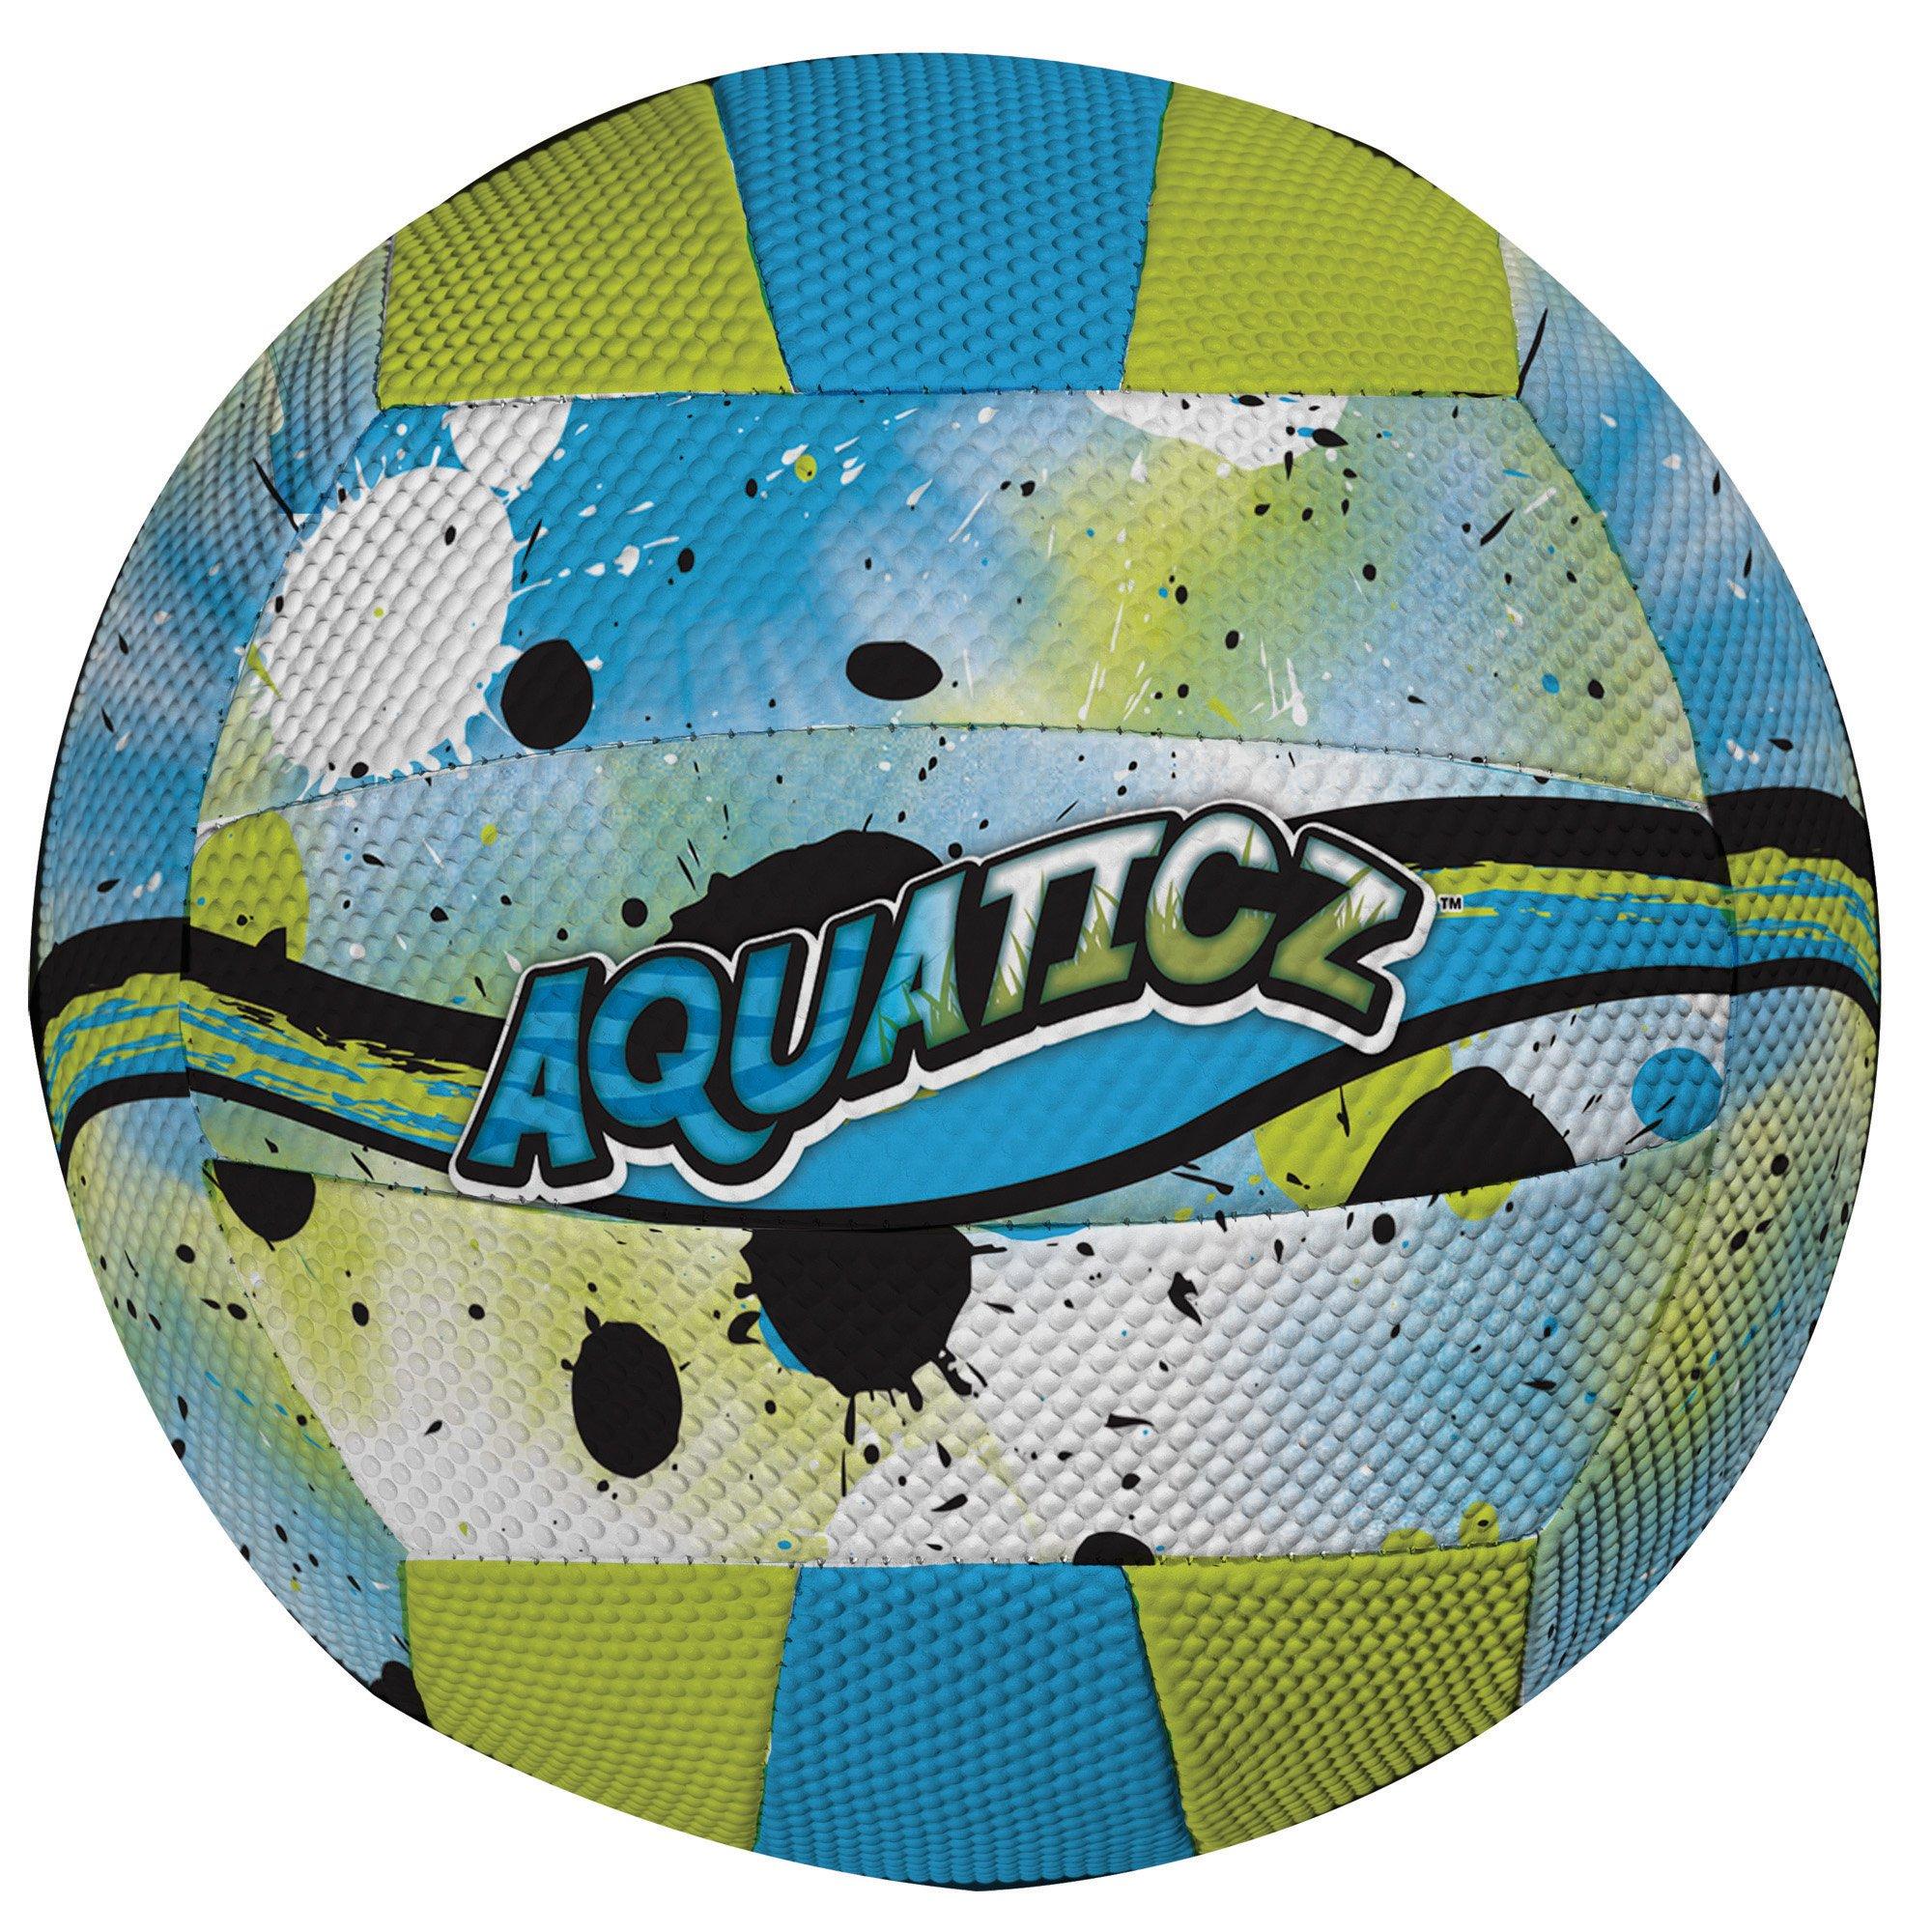 Franklin Sports Aquaticz Volleyball Water Pool Toy